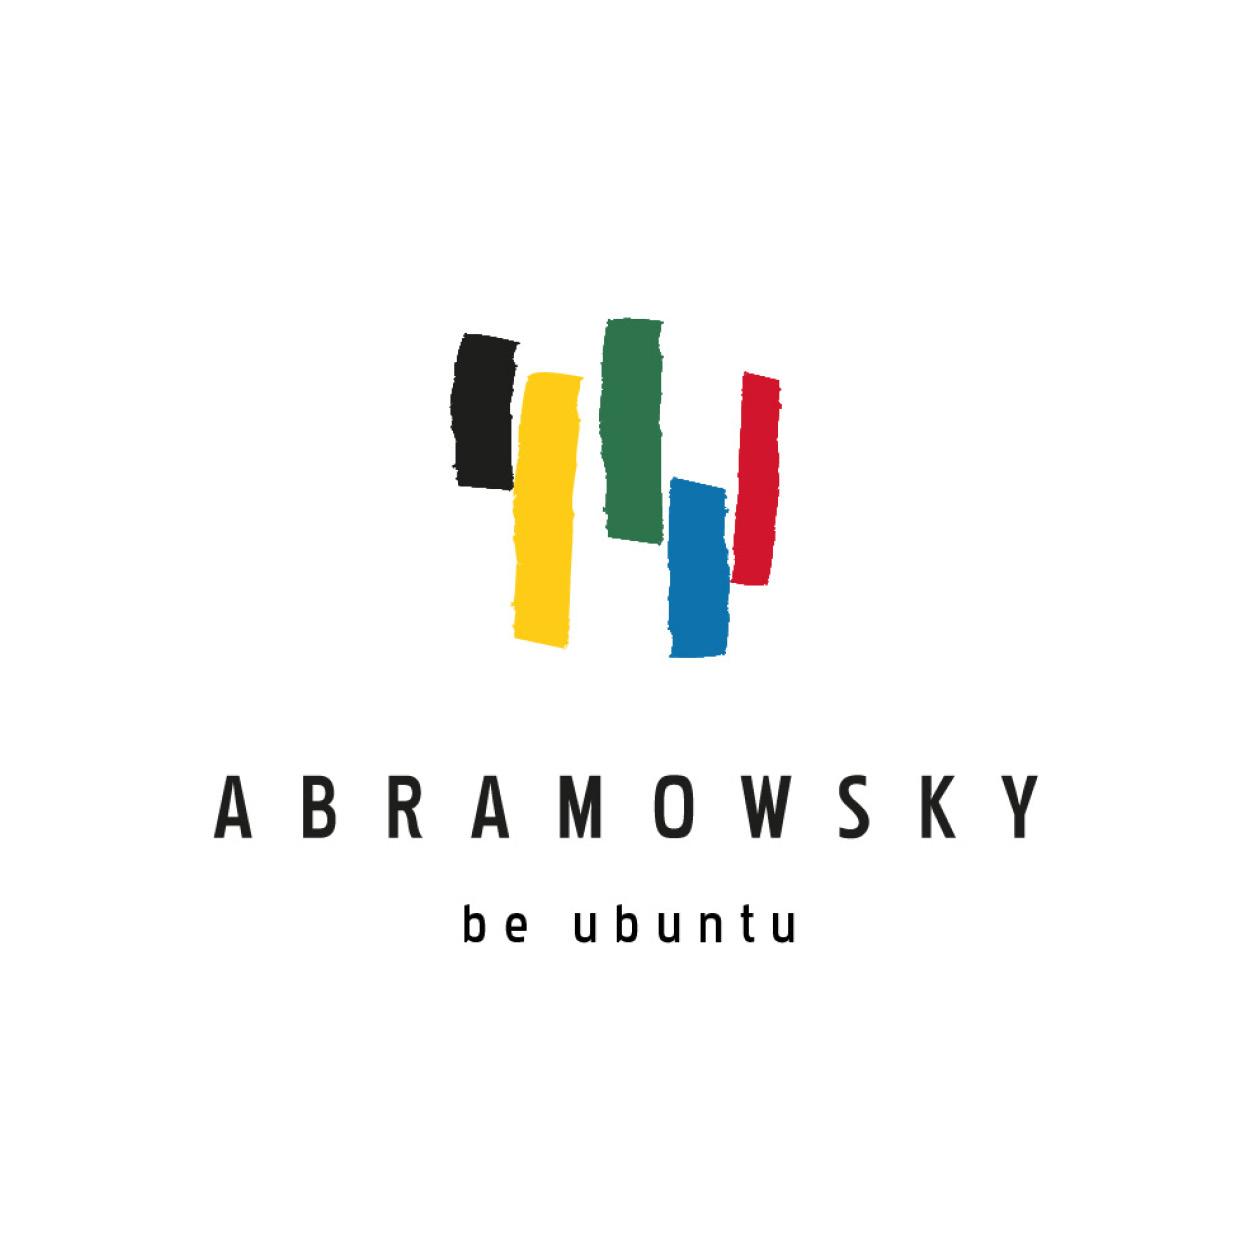 Abramowsky